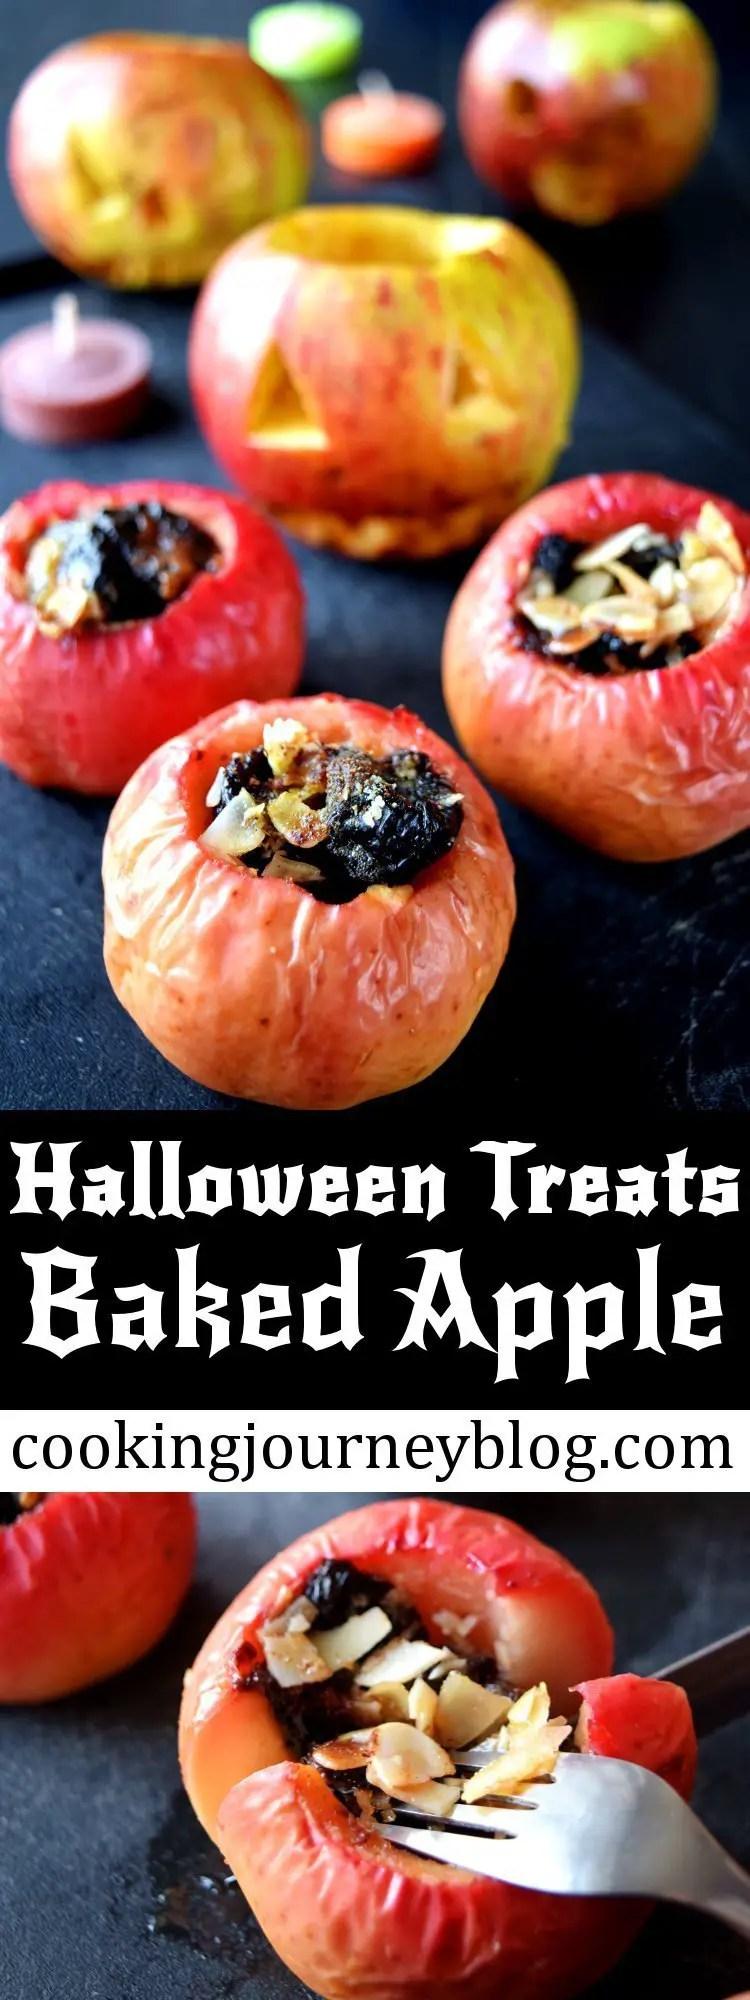 Baked apple – Healthy Halloween treats